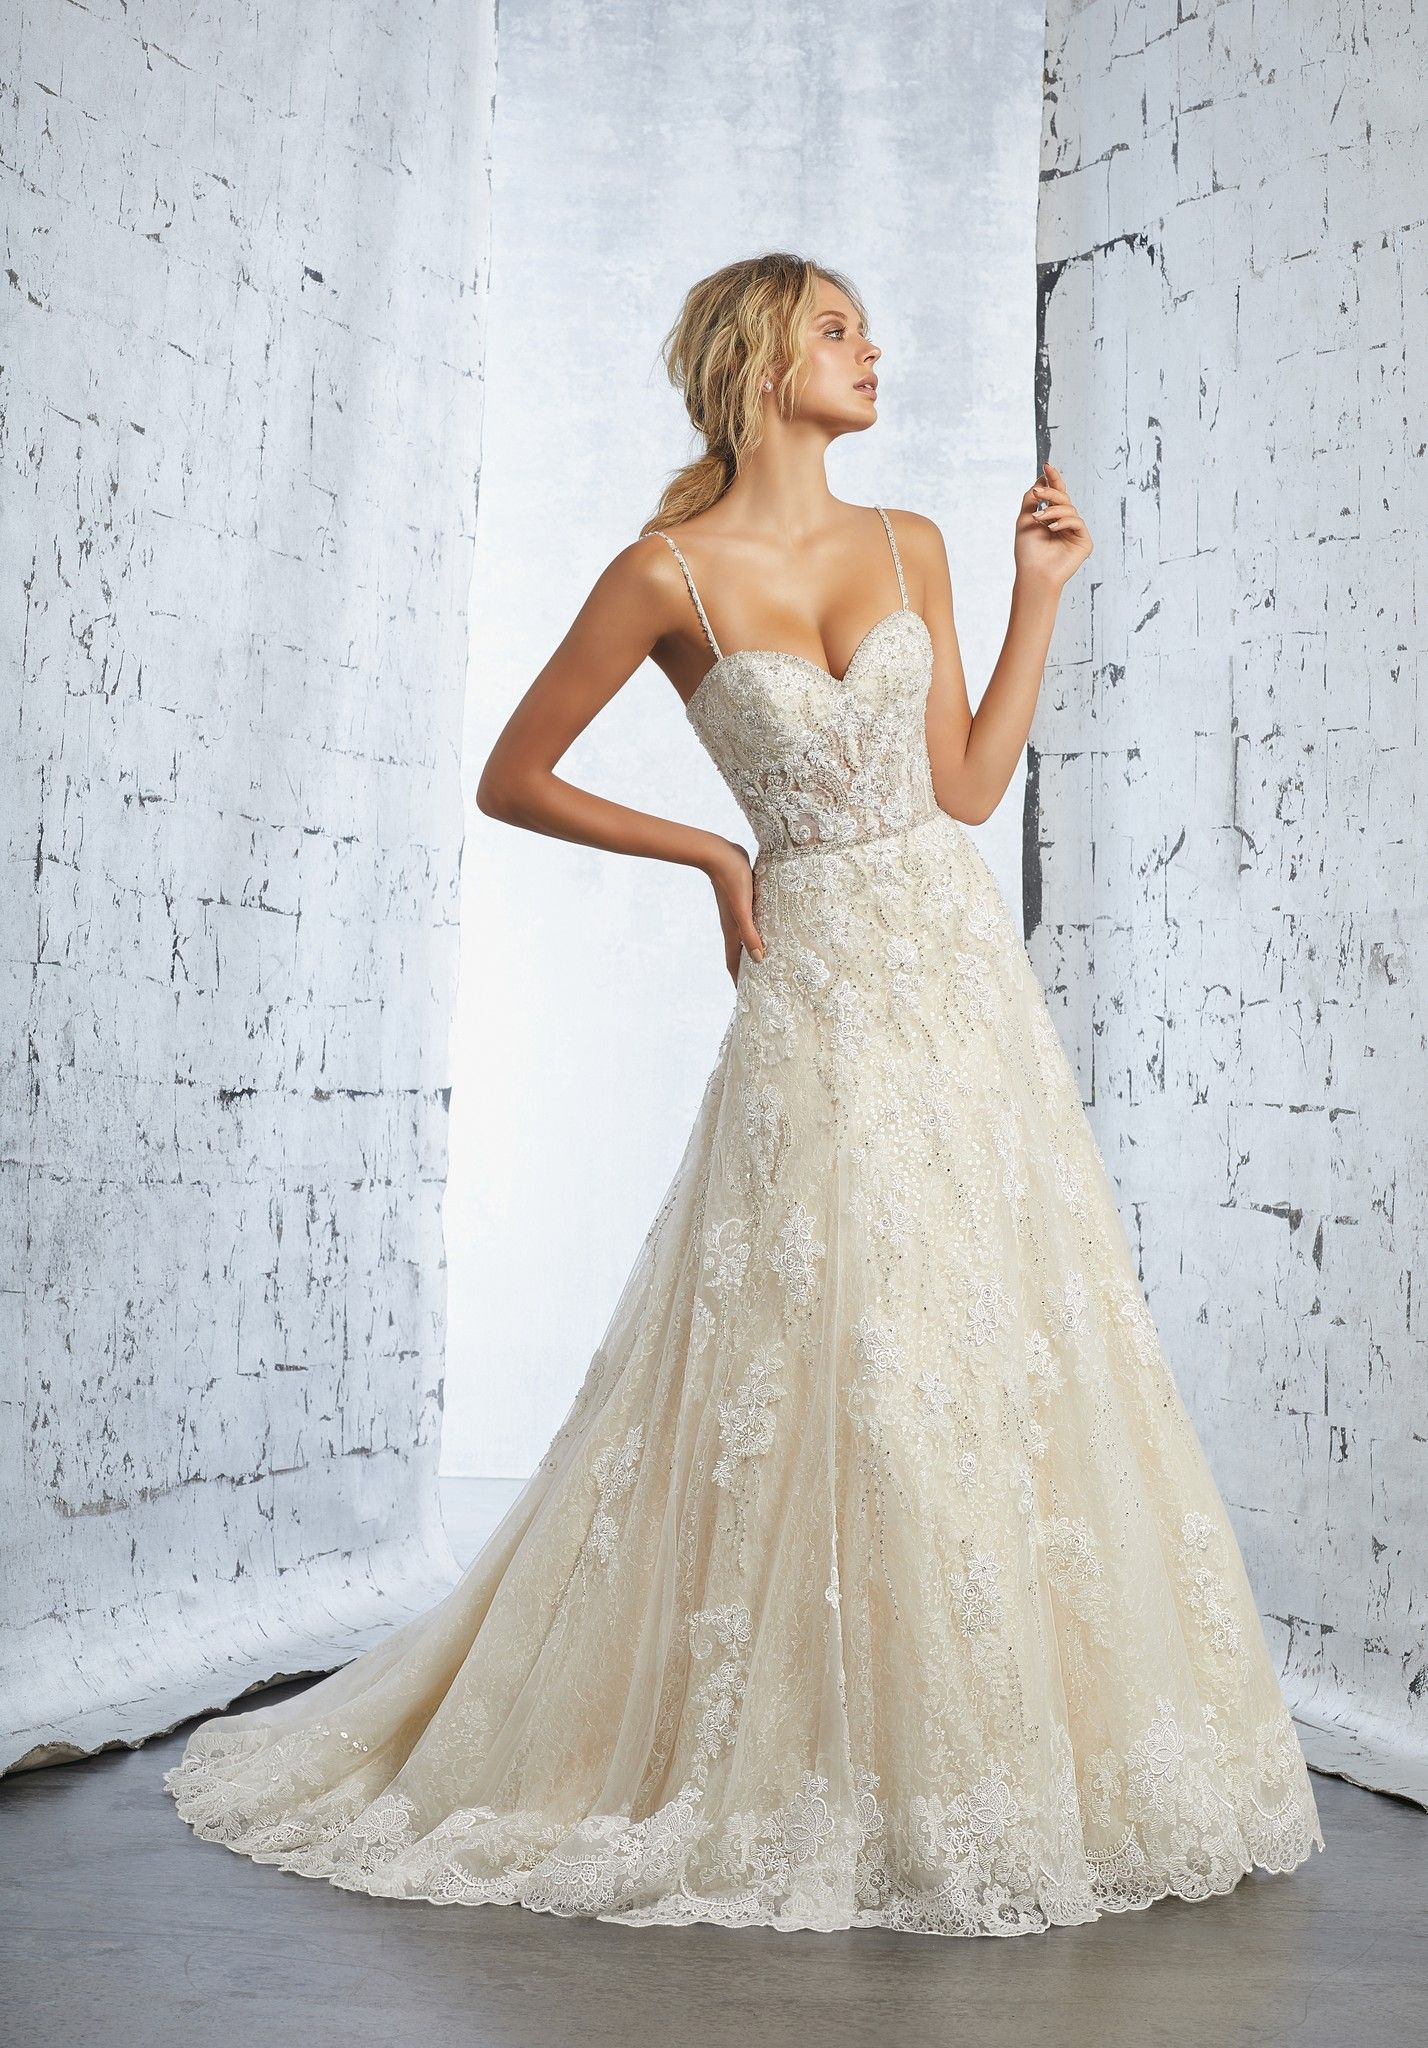 Mori lee madeline gardner wedding dress  Angelina Faccenda  Bridesmaid Dresses  Morilee Madeline Gardner